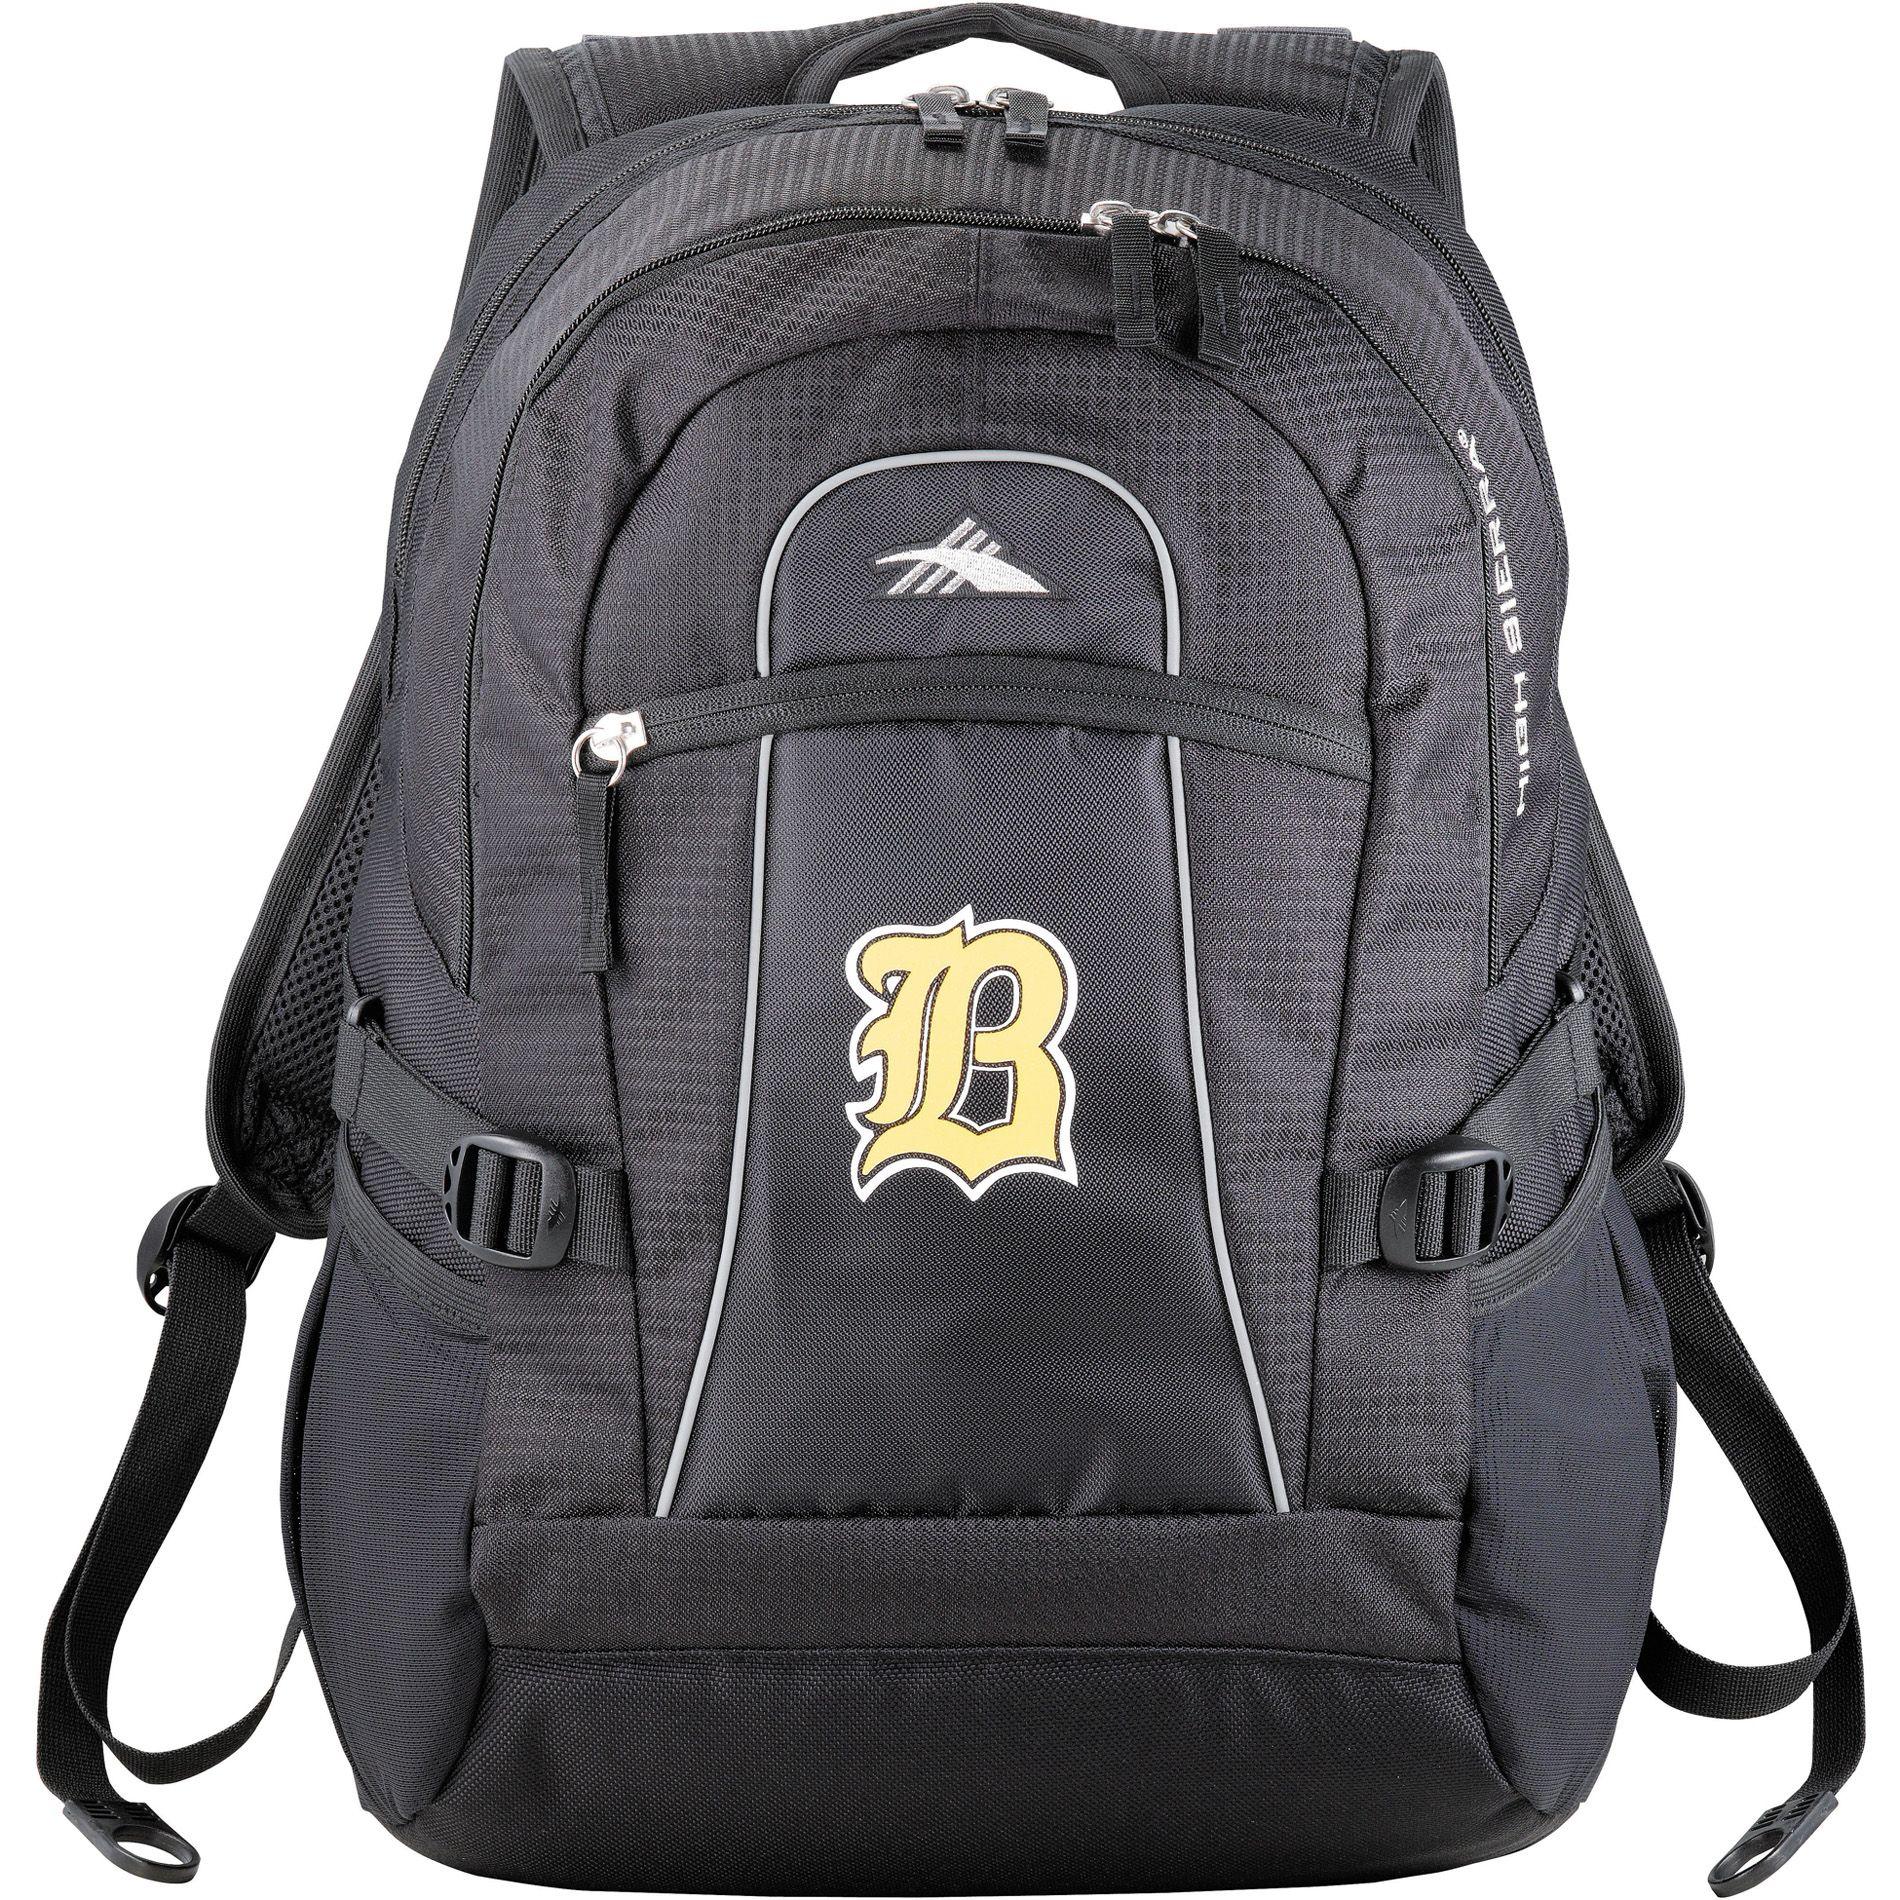 High Sierra Fly-By Level Compu-Backpack